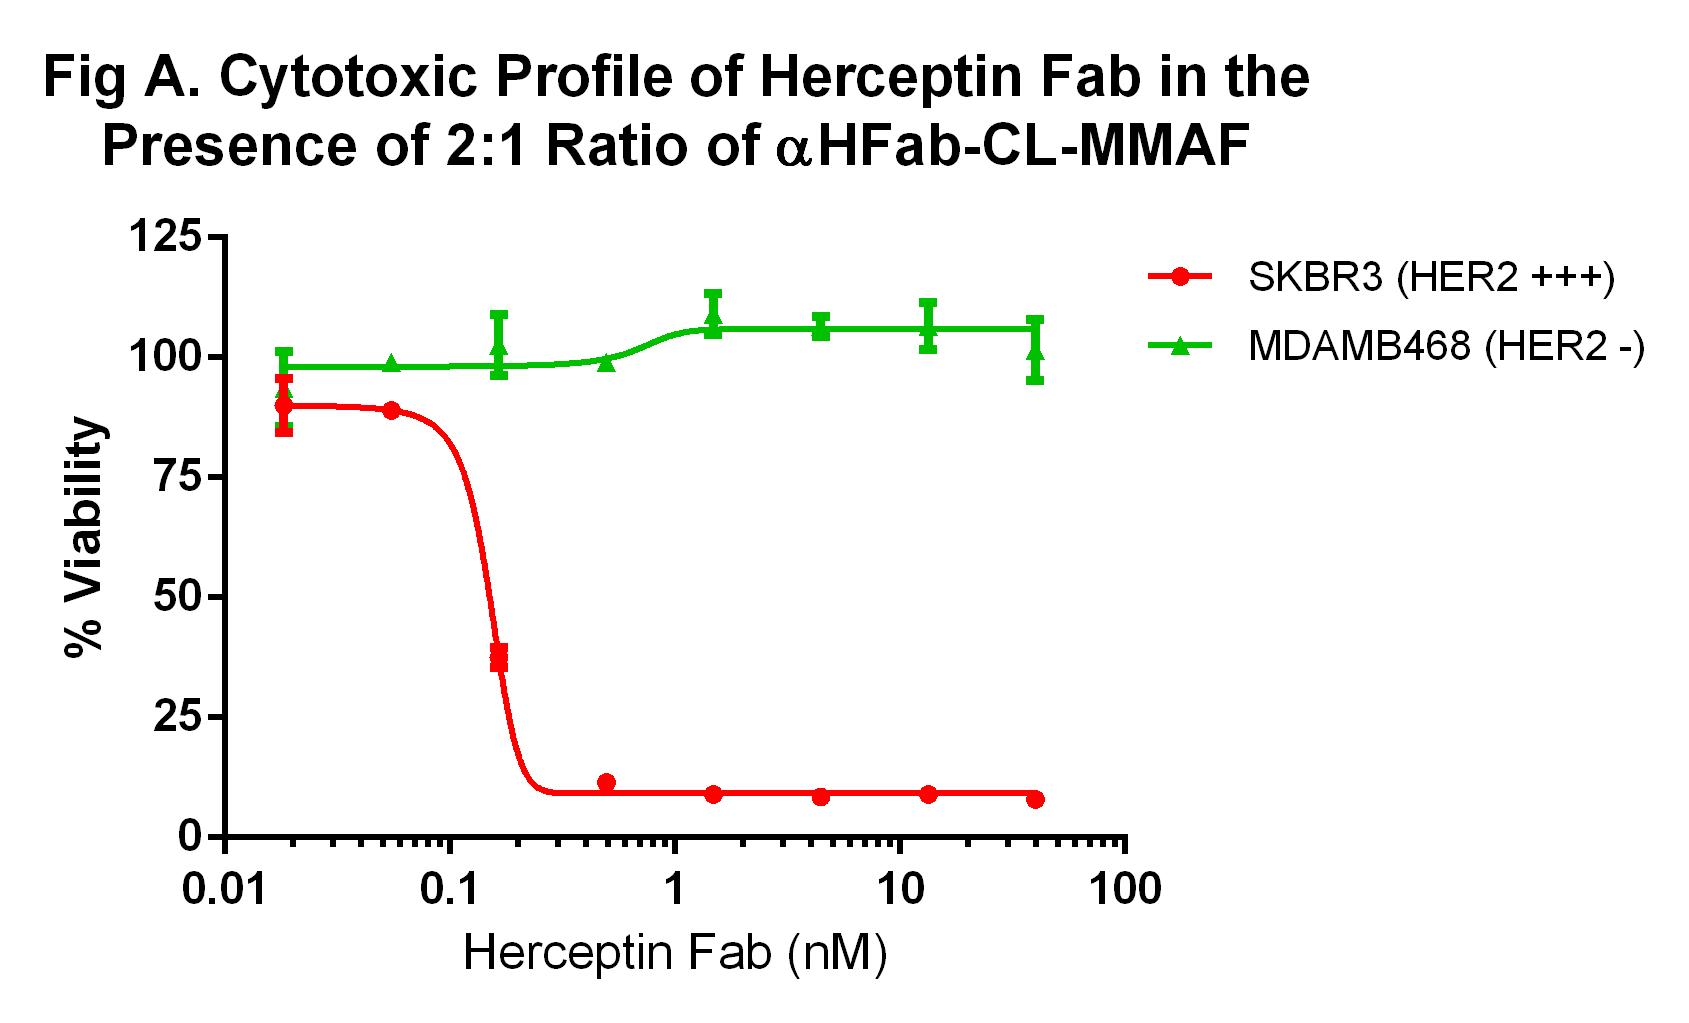 Moradec LLC - Products - Antibody-Drug Conjugates - AH-106-PB